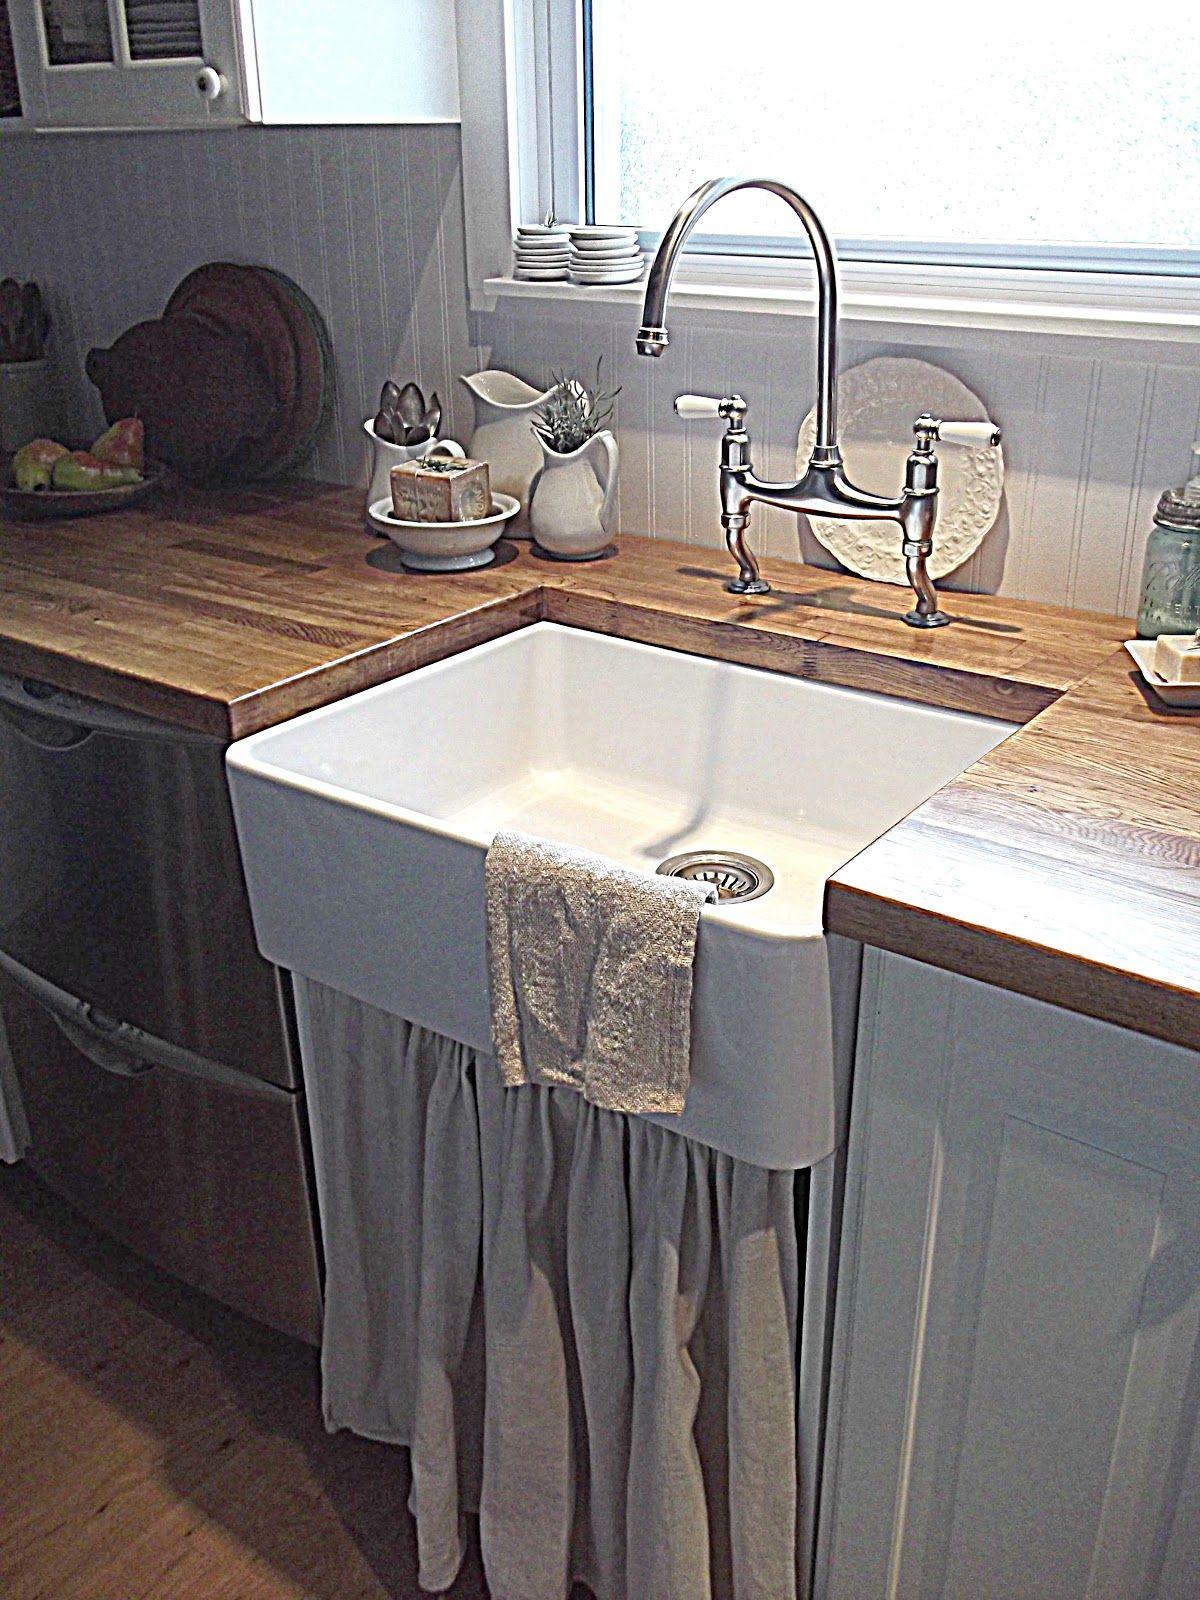 Rustic Farmhouse's farmhouse sink.....LOVE it Rustic